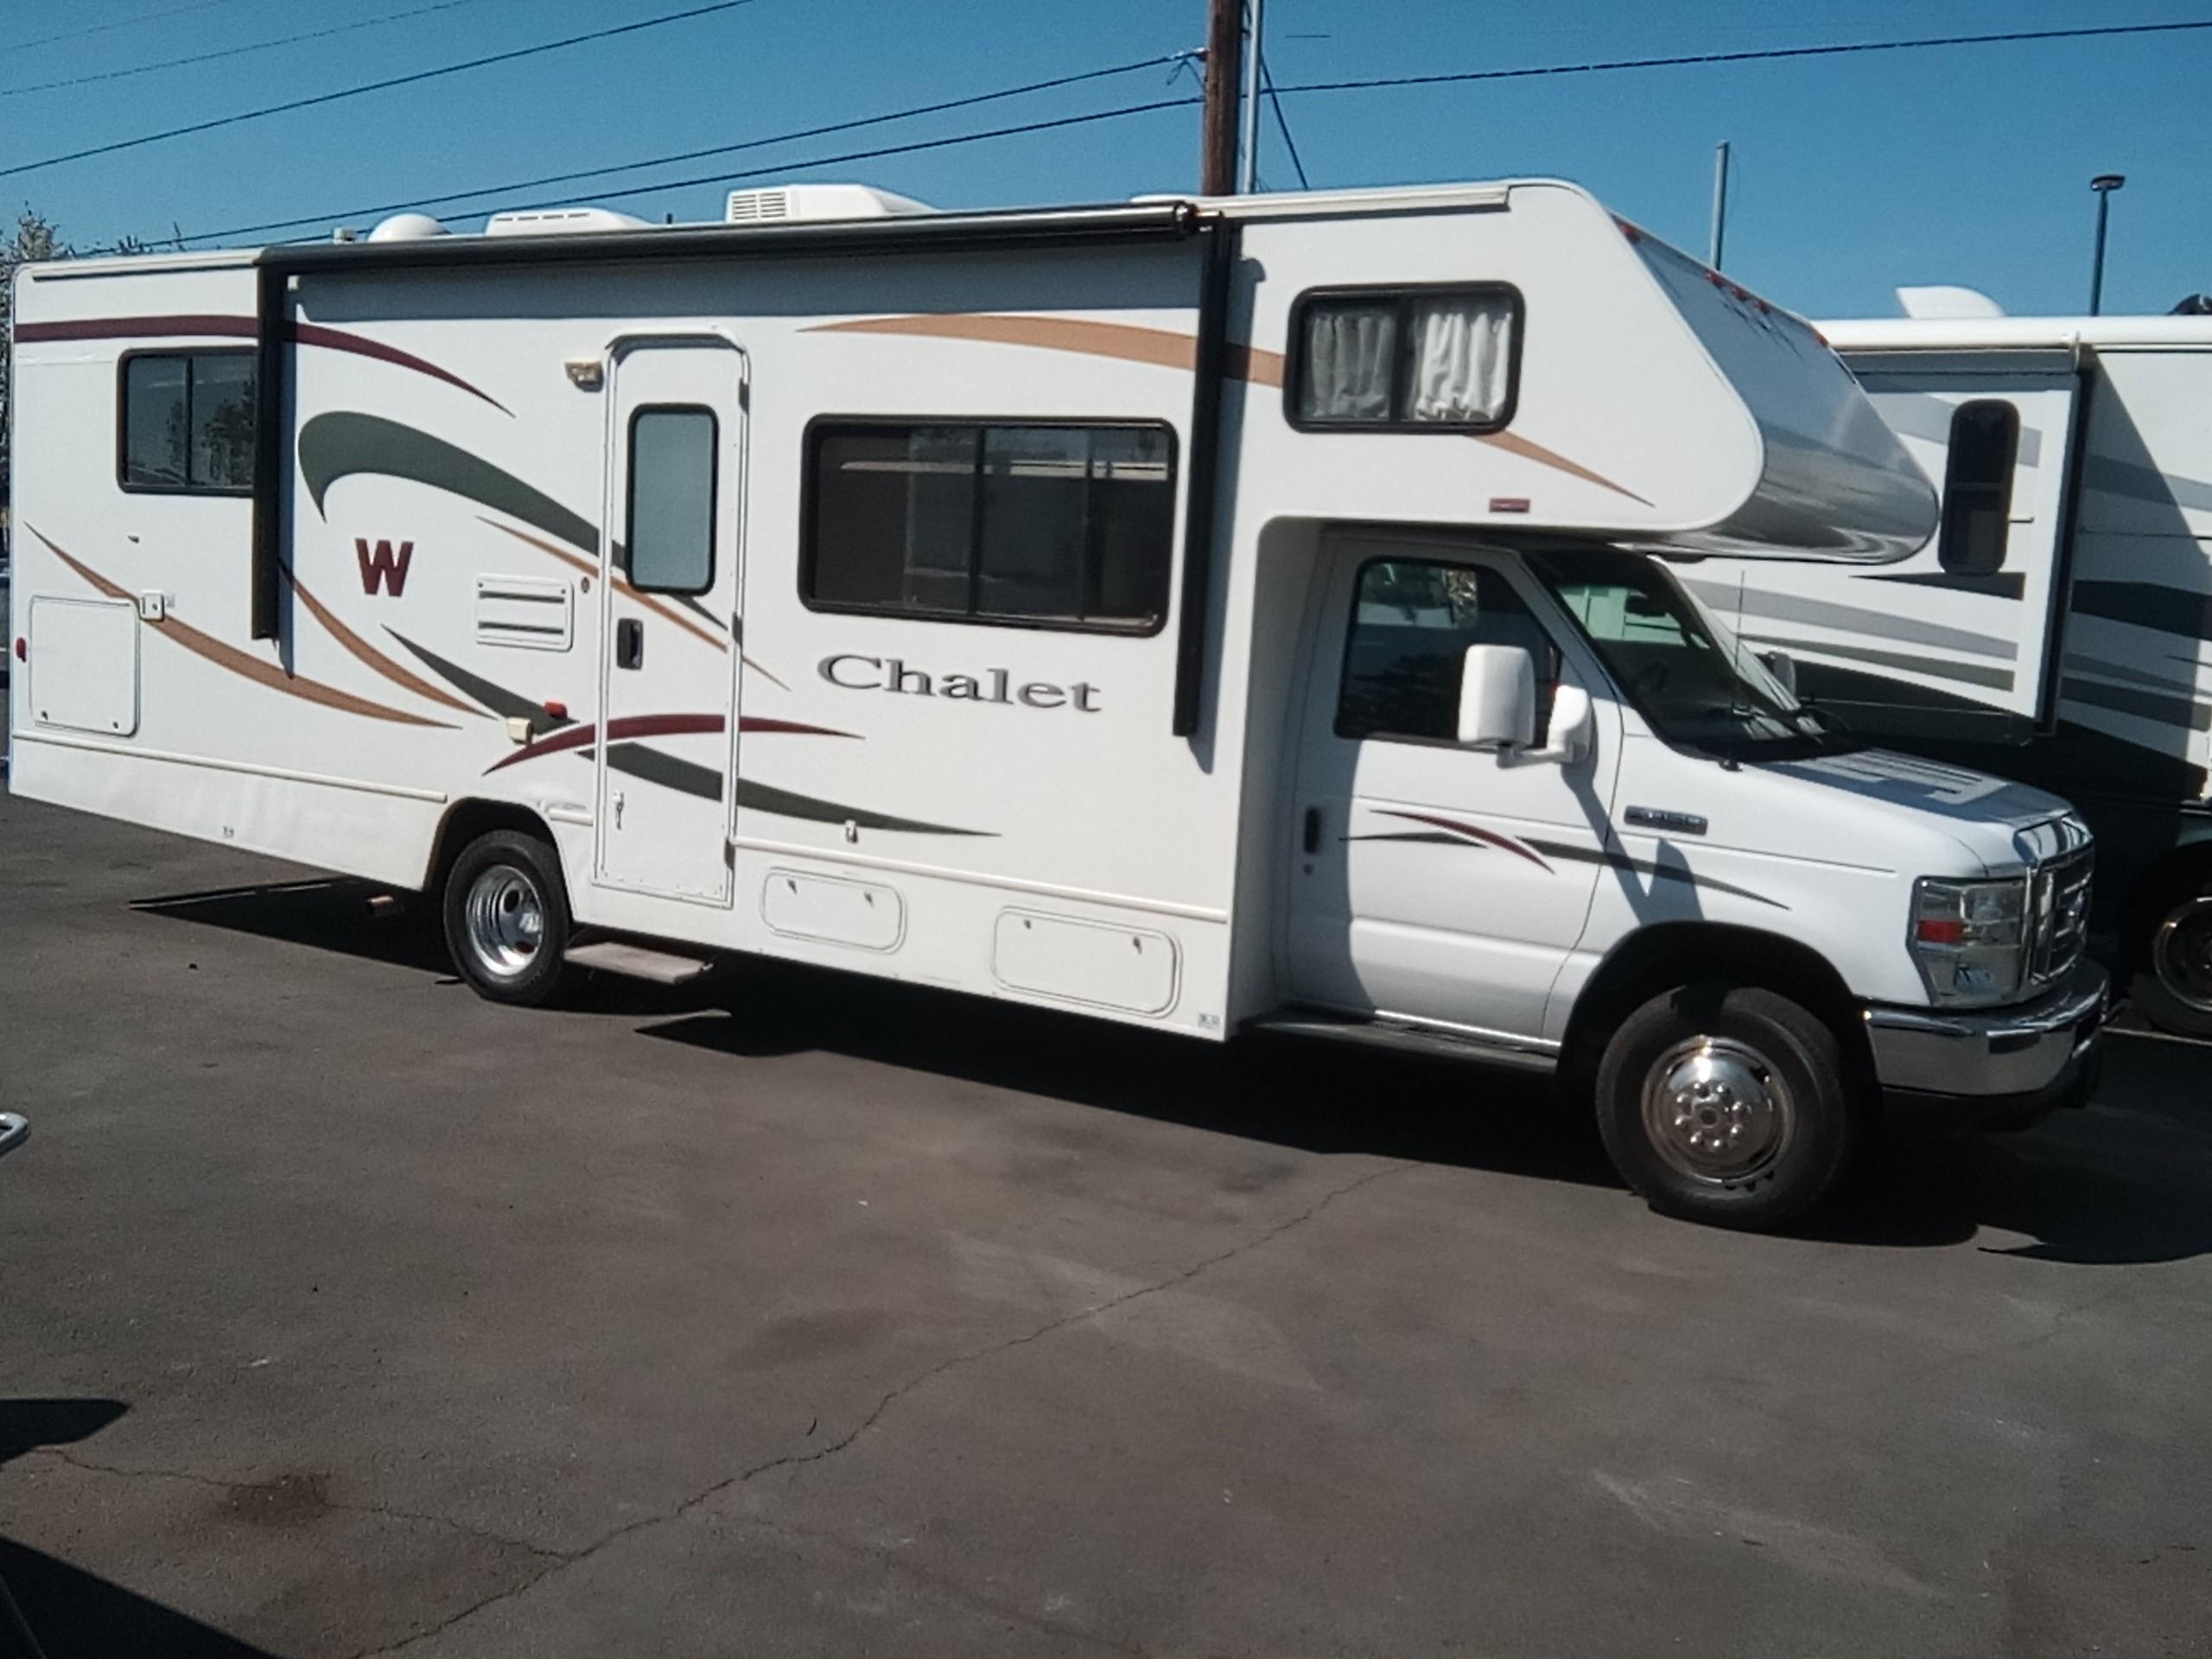 Used, 2009, Winnebago, CHALET, RV - Class C